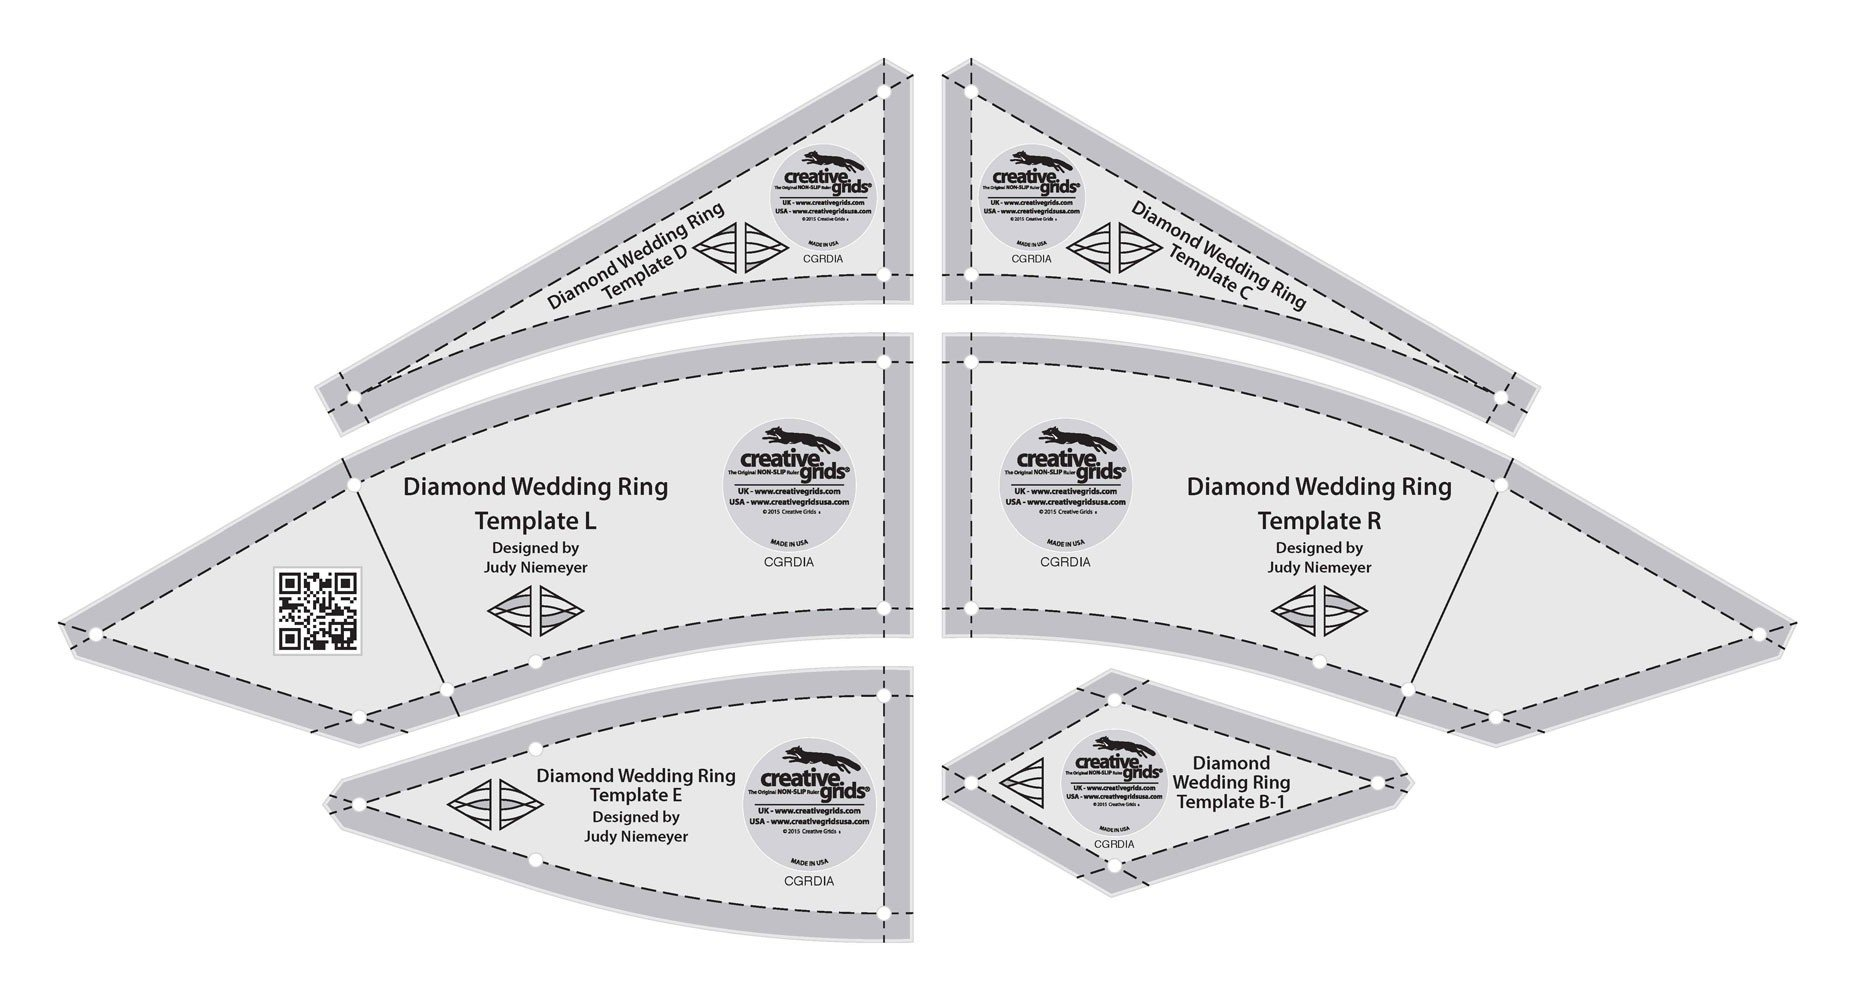 Creative Grids Diamond Wedding Ring Templates Quilt Ruler